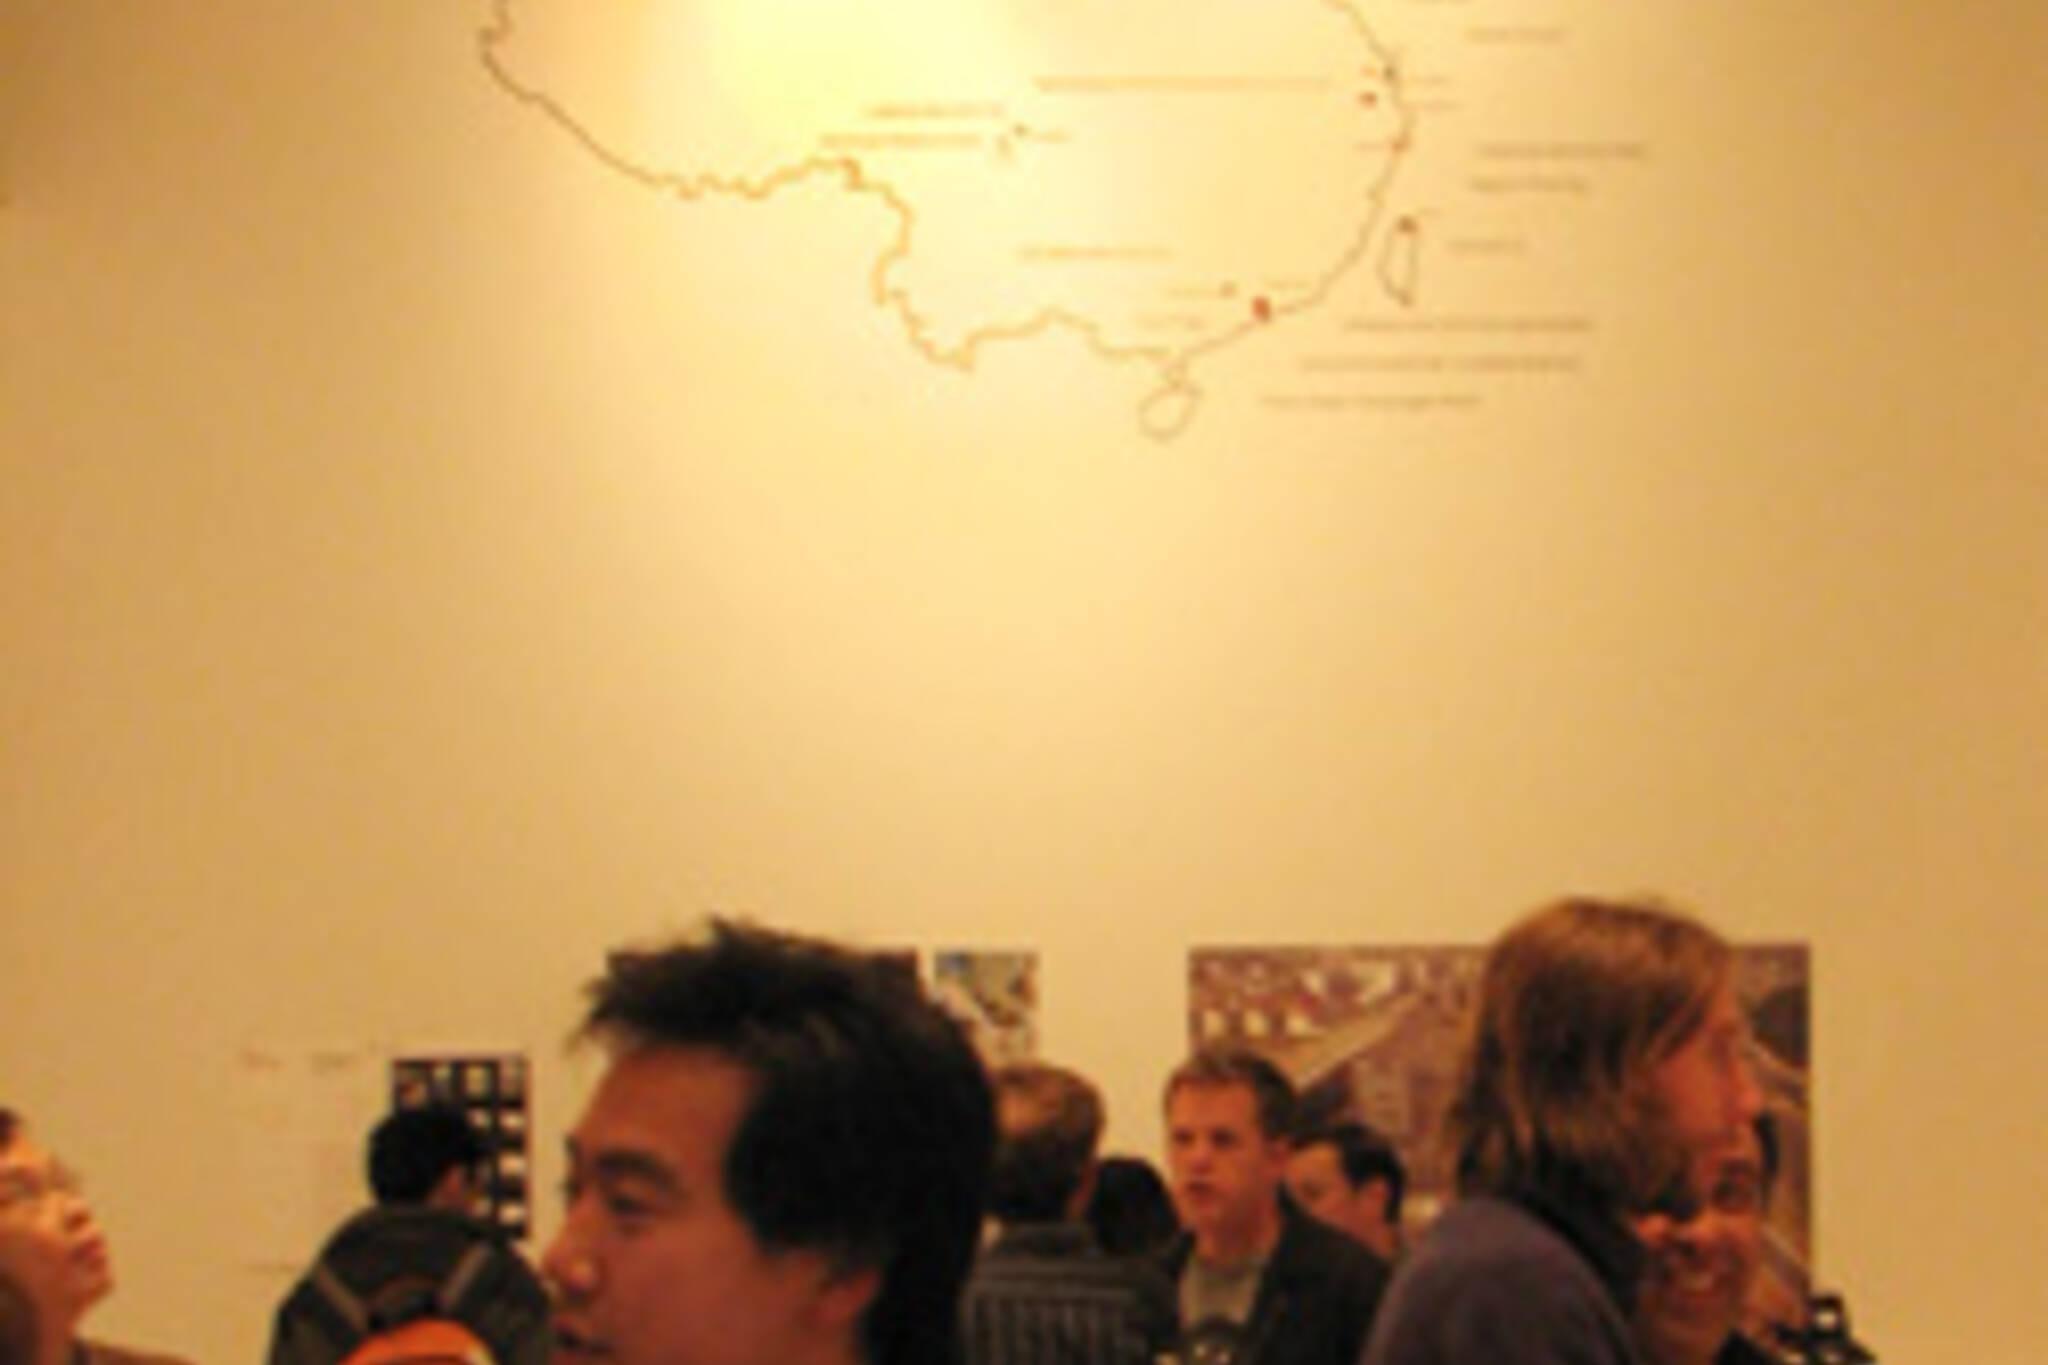 20061104_detours_china.jpg